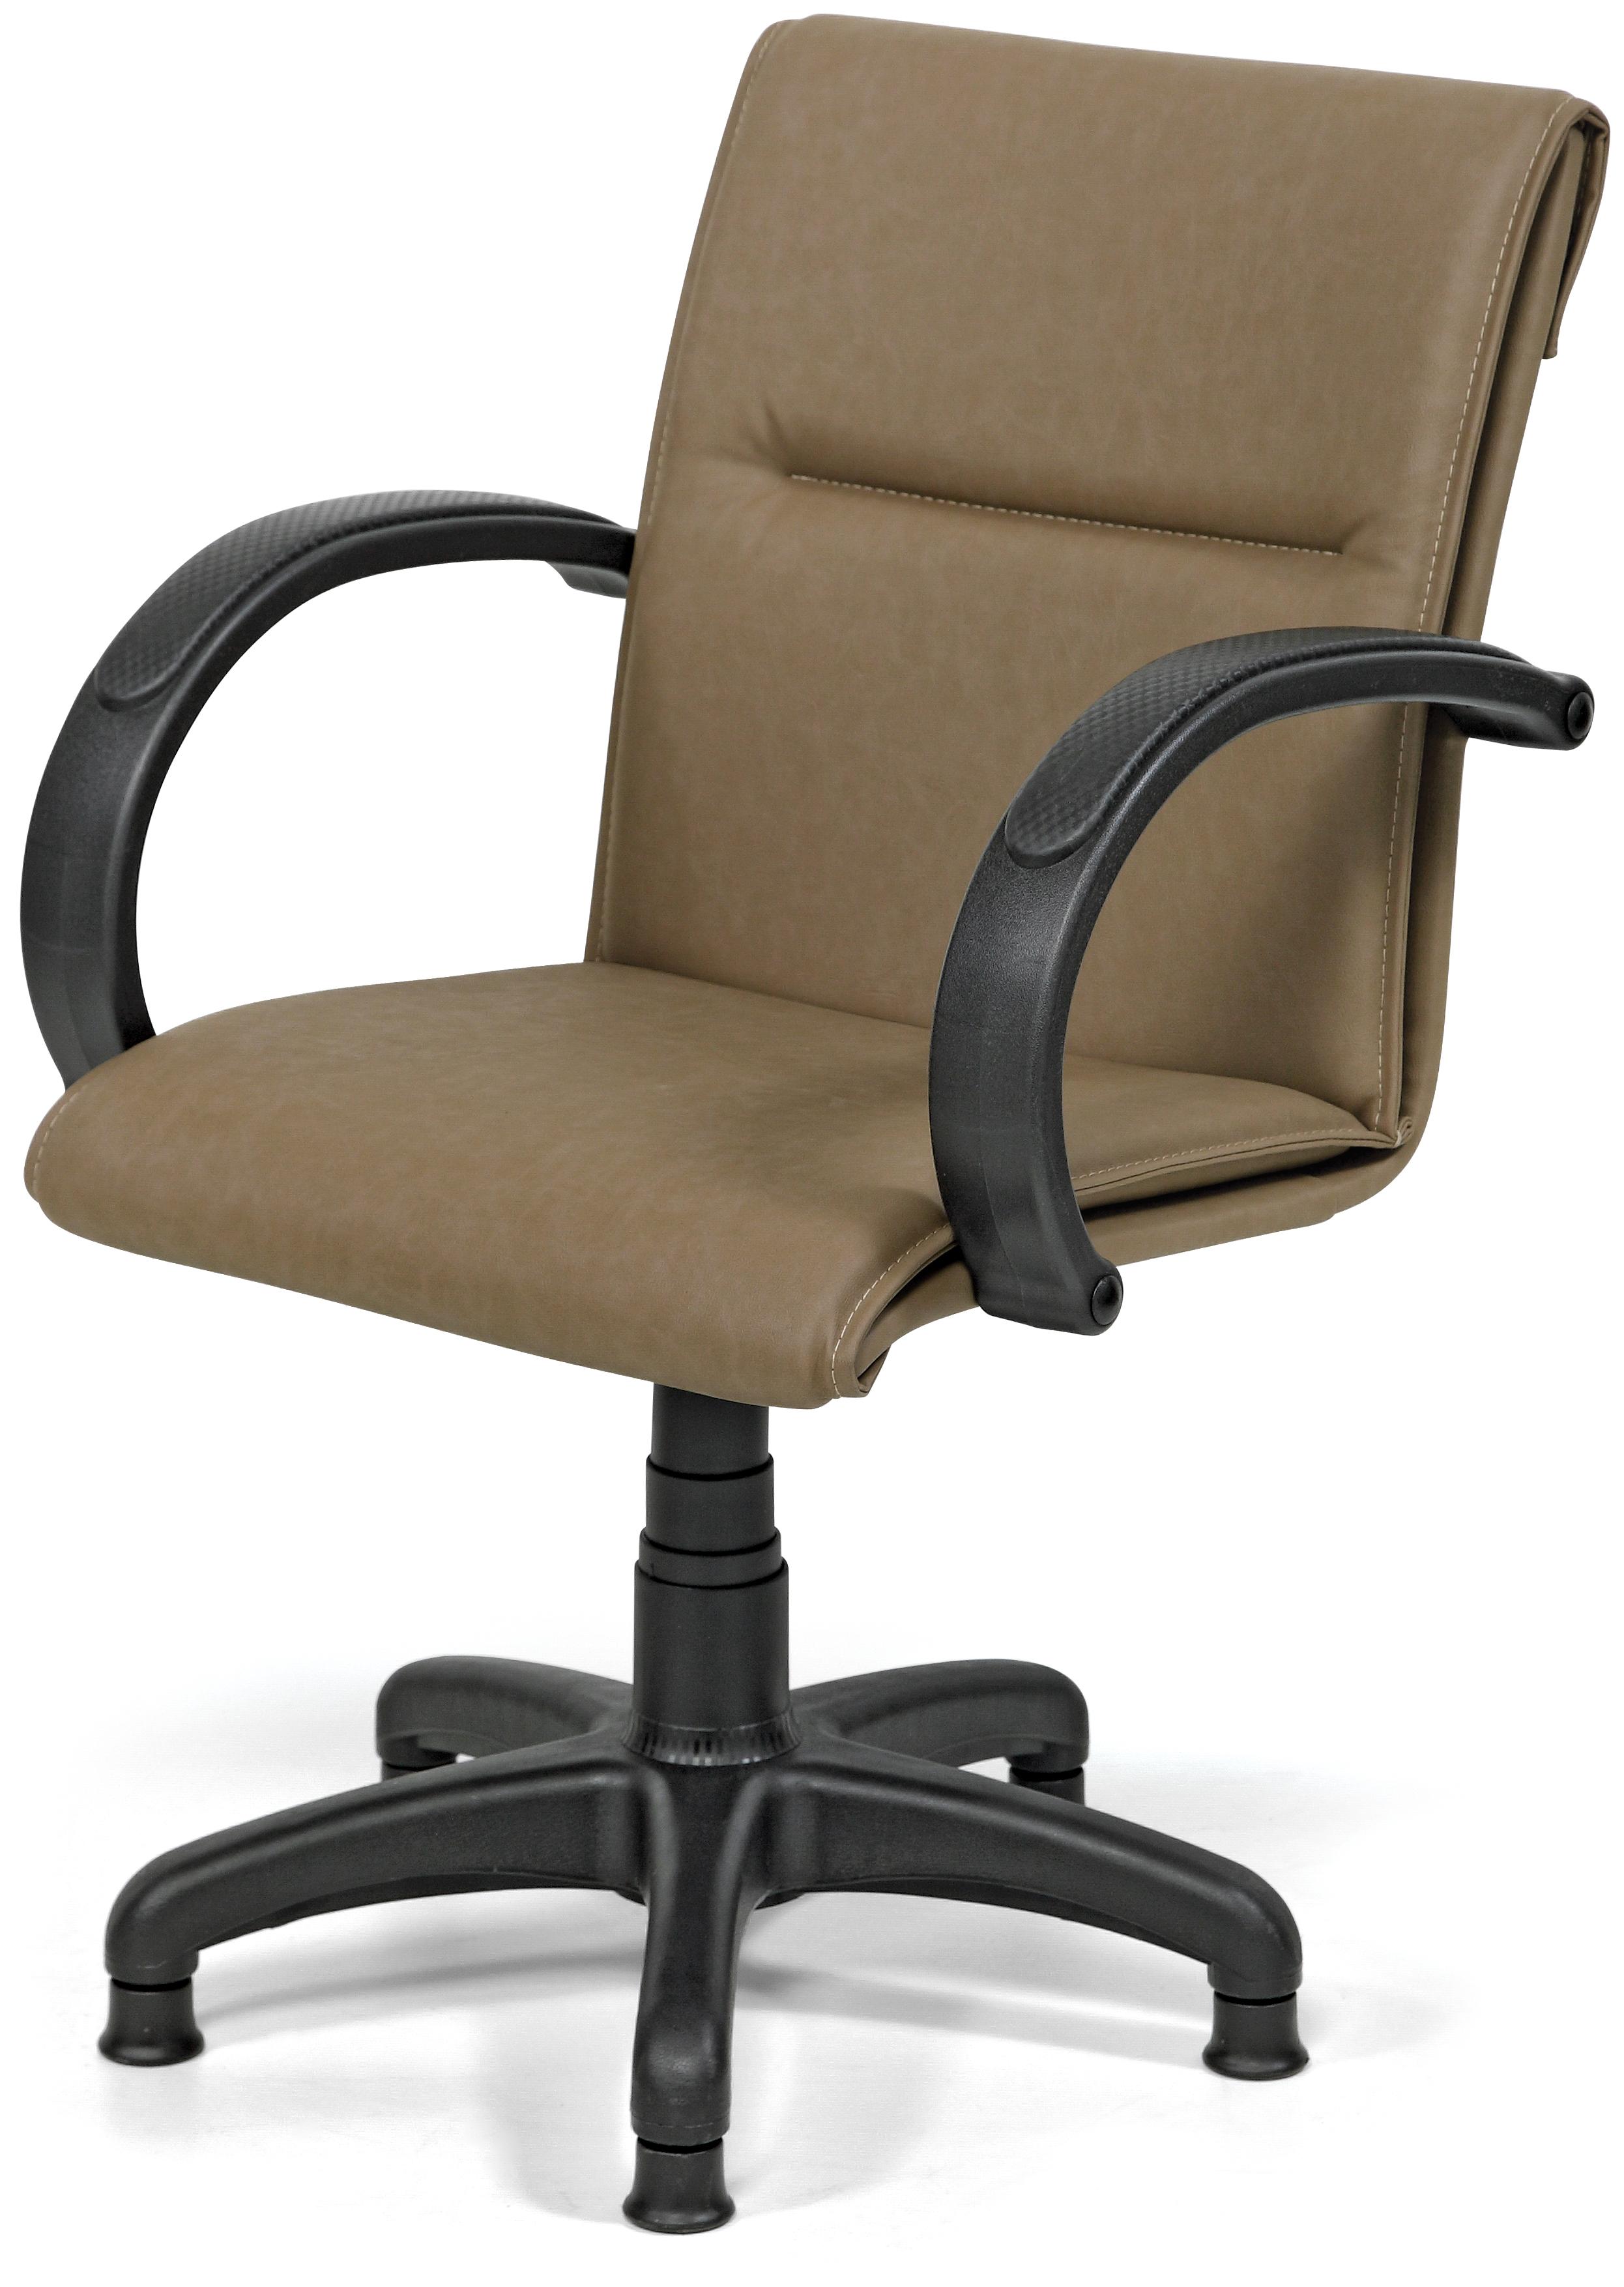 Economic Office Chair